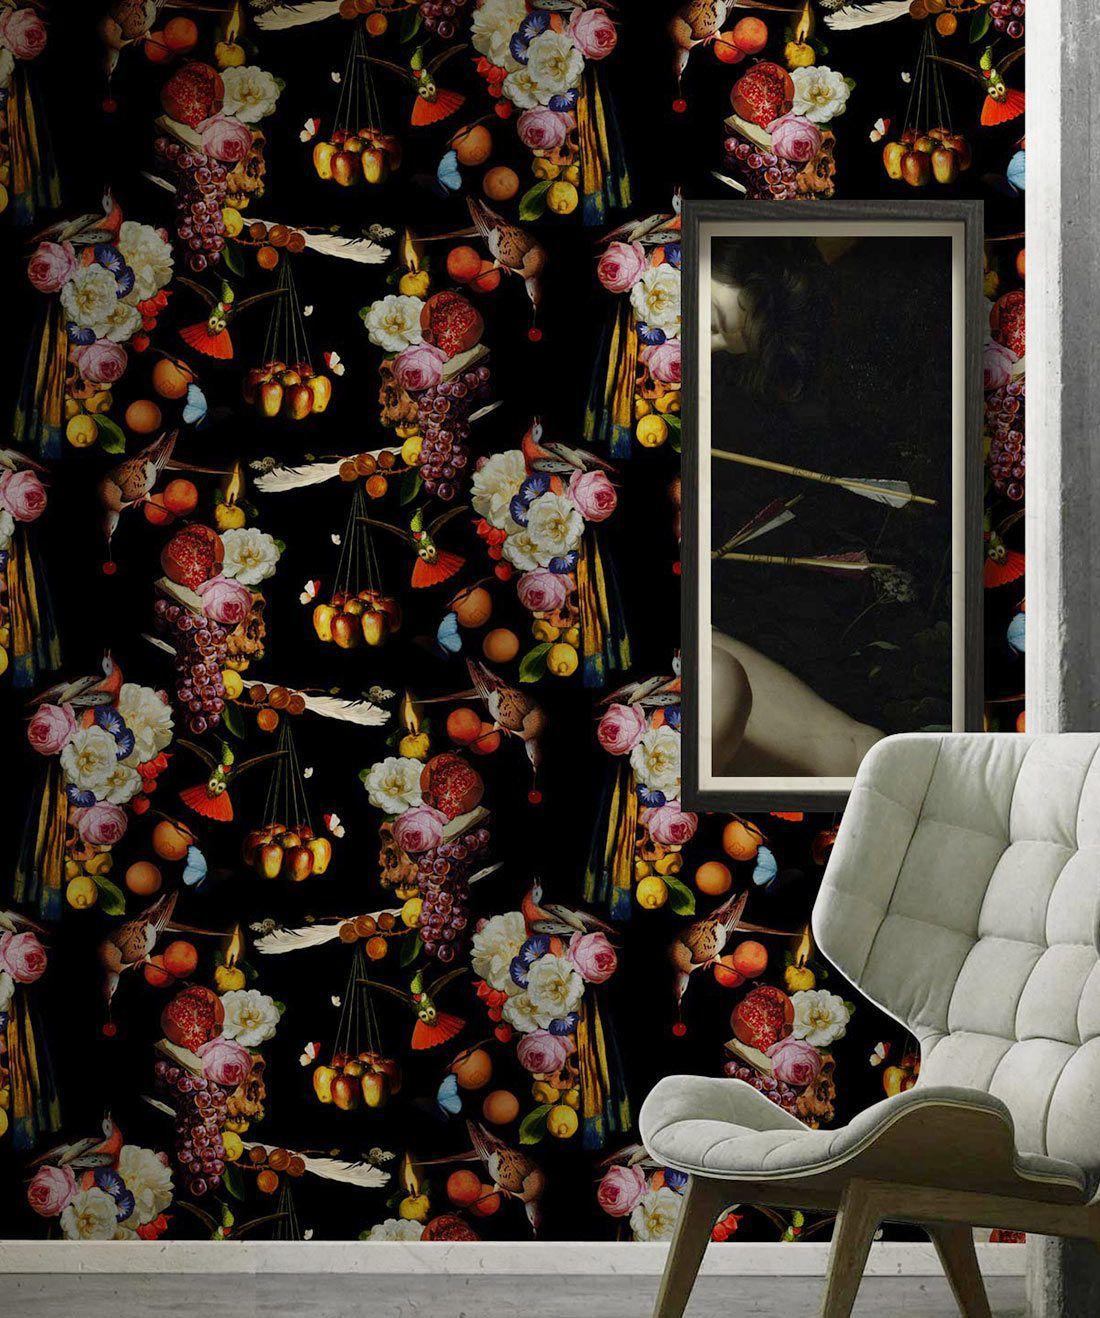 Gluttony Wallpaper • Food wallpaper • Fruit Decor